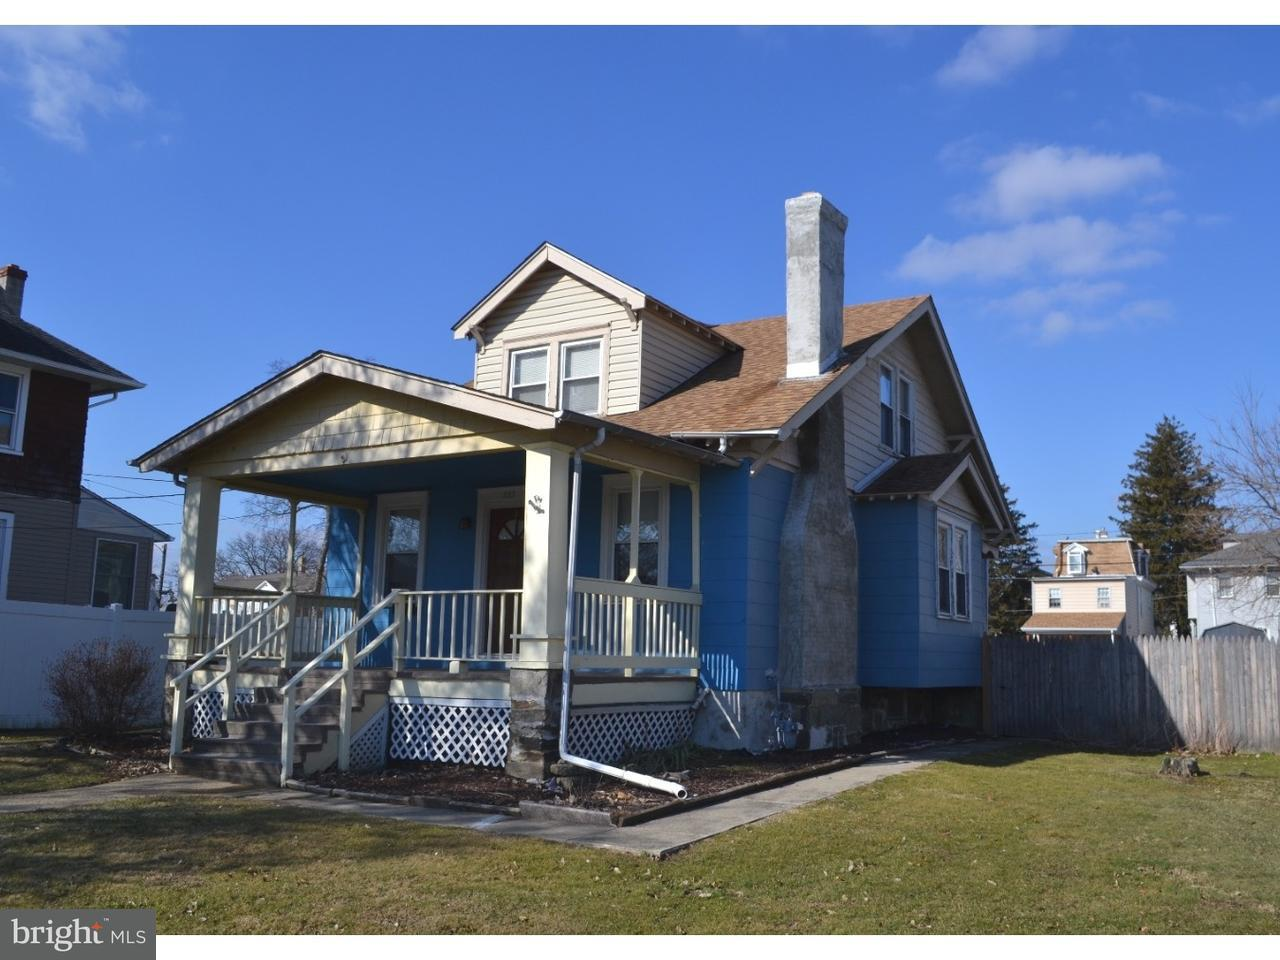 Single Family Home for Sale at 555 SENECA Avenue Norwood, Pennsylvania 19074 United States